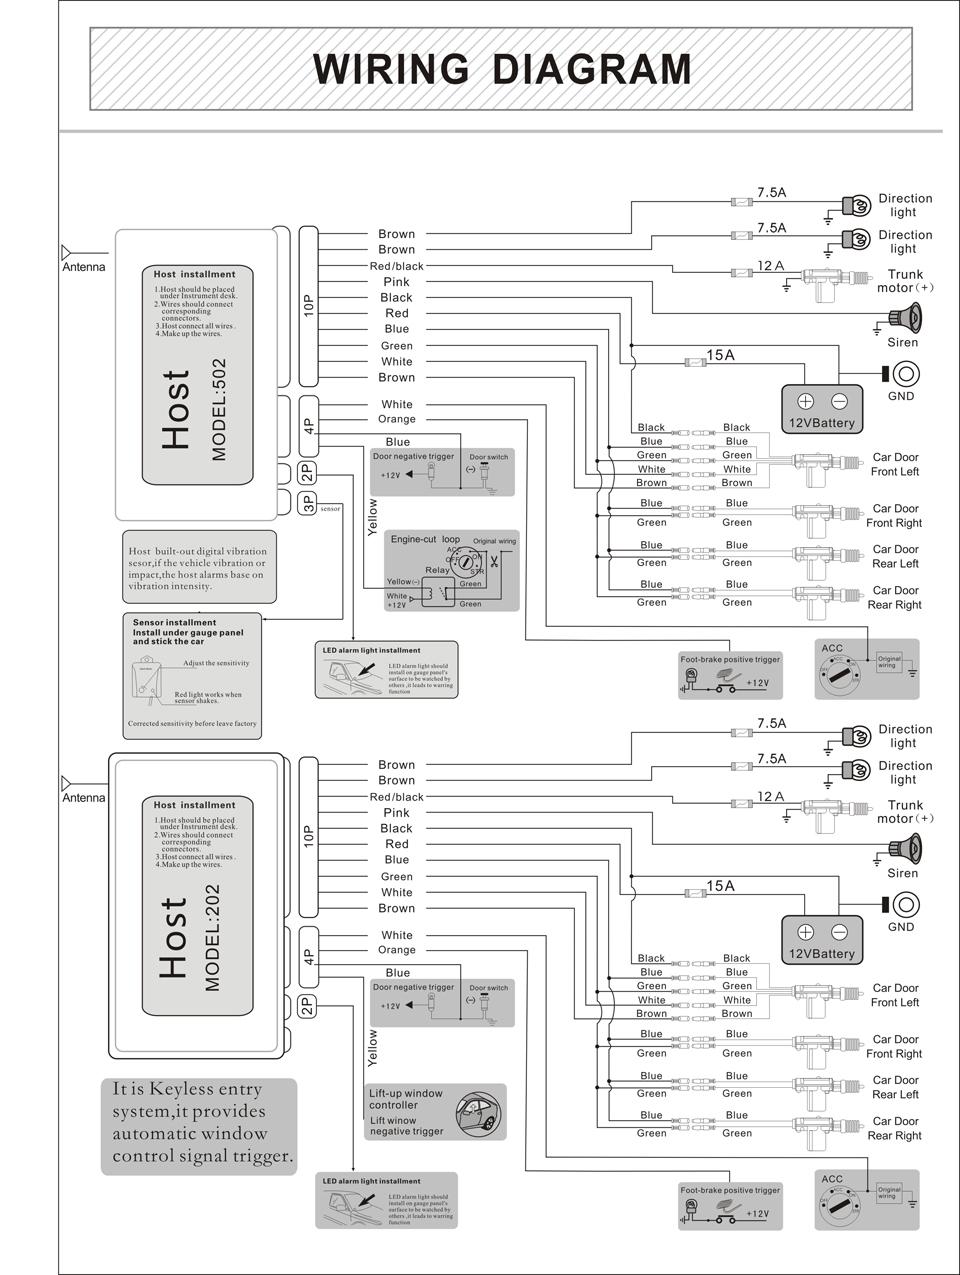 AM0035 -02